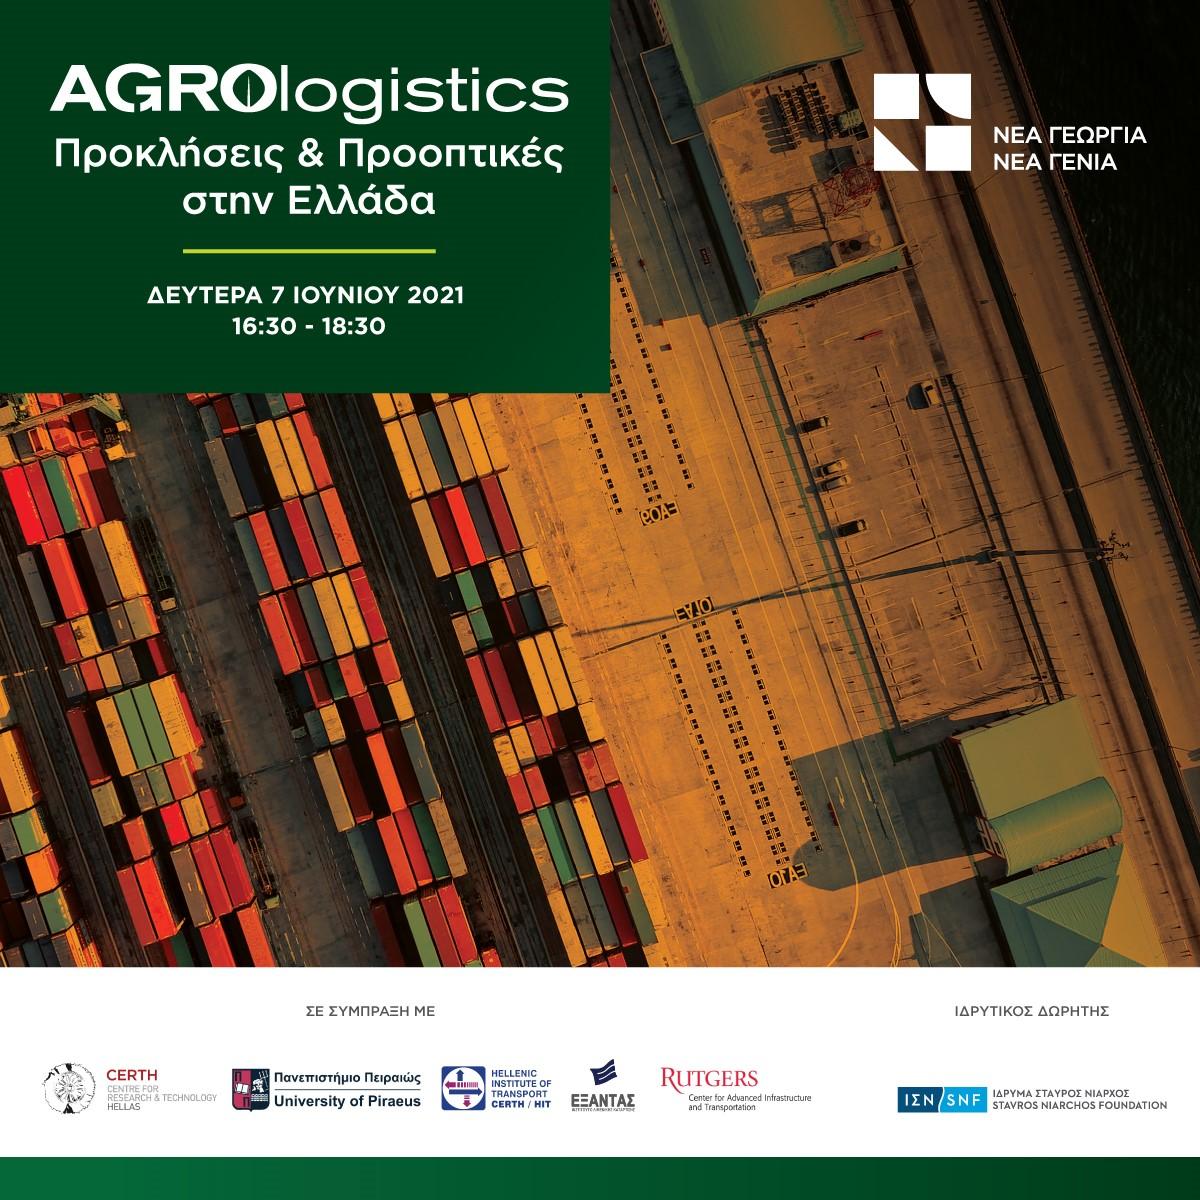 Agrologistics